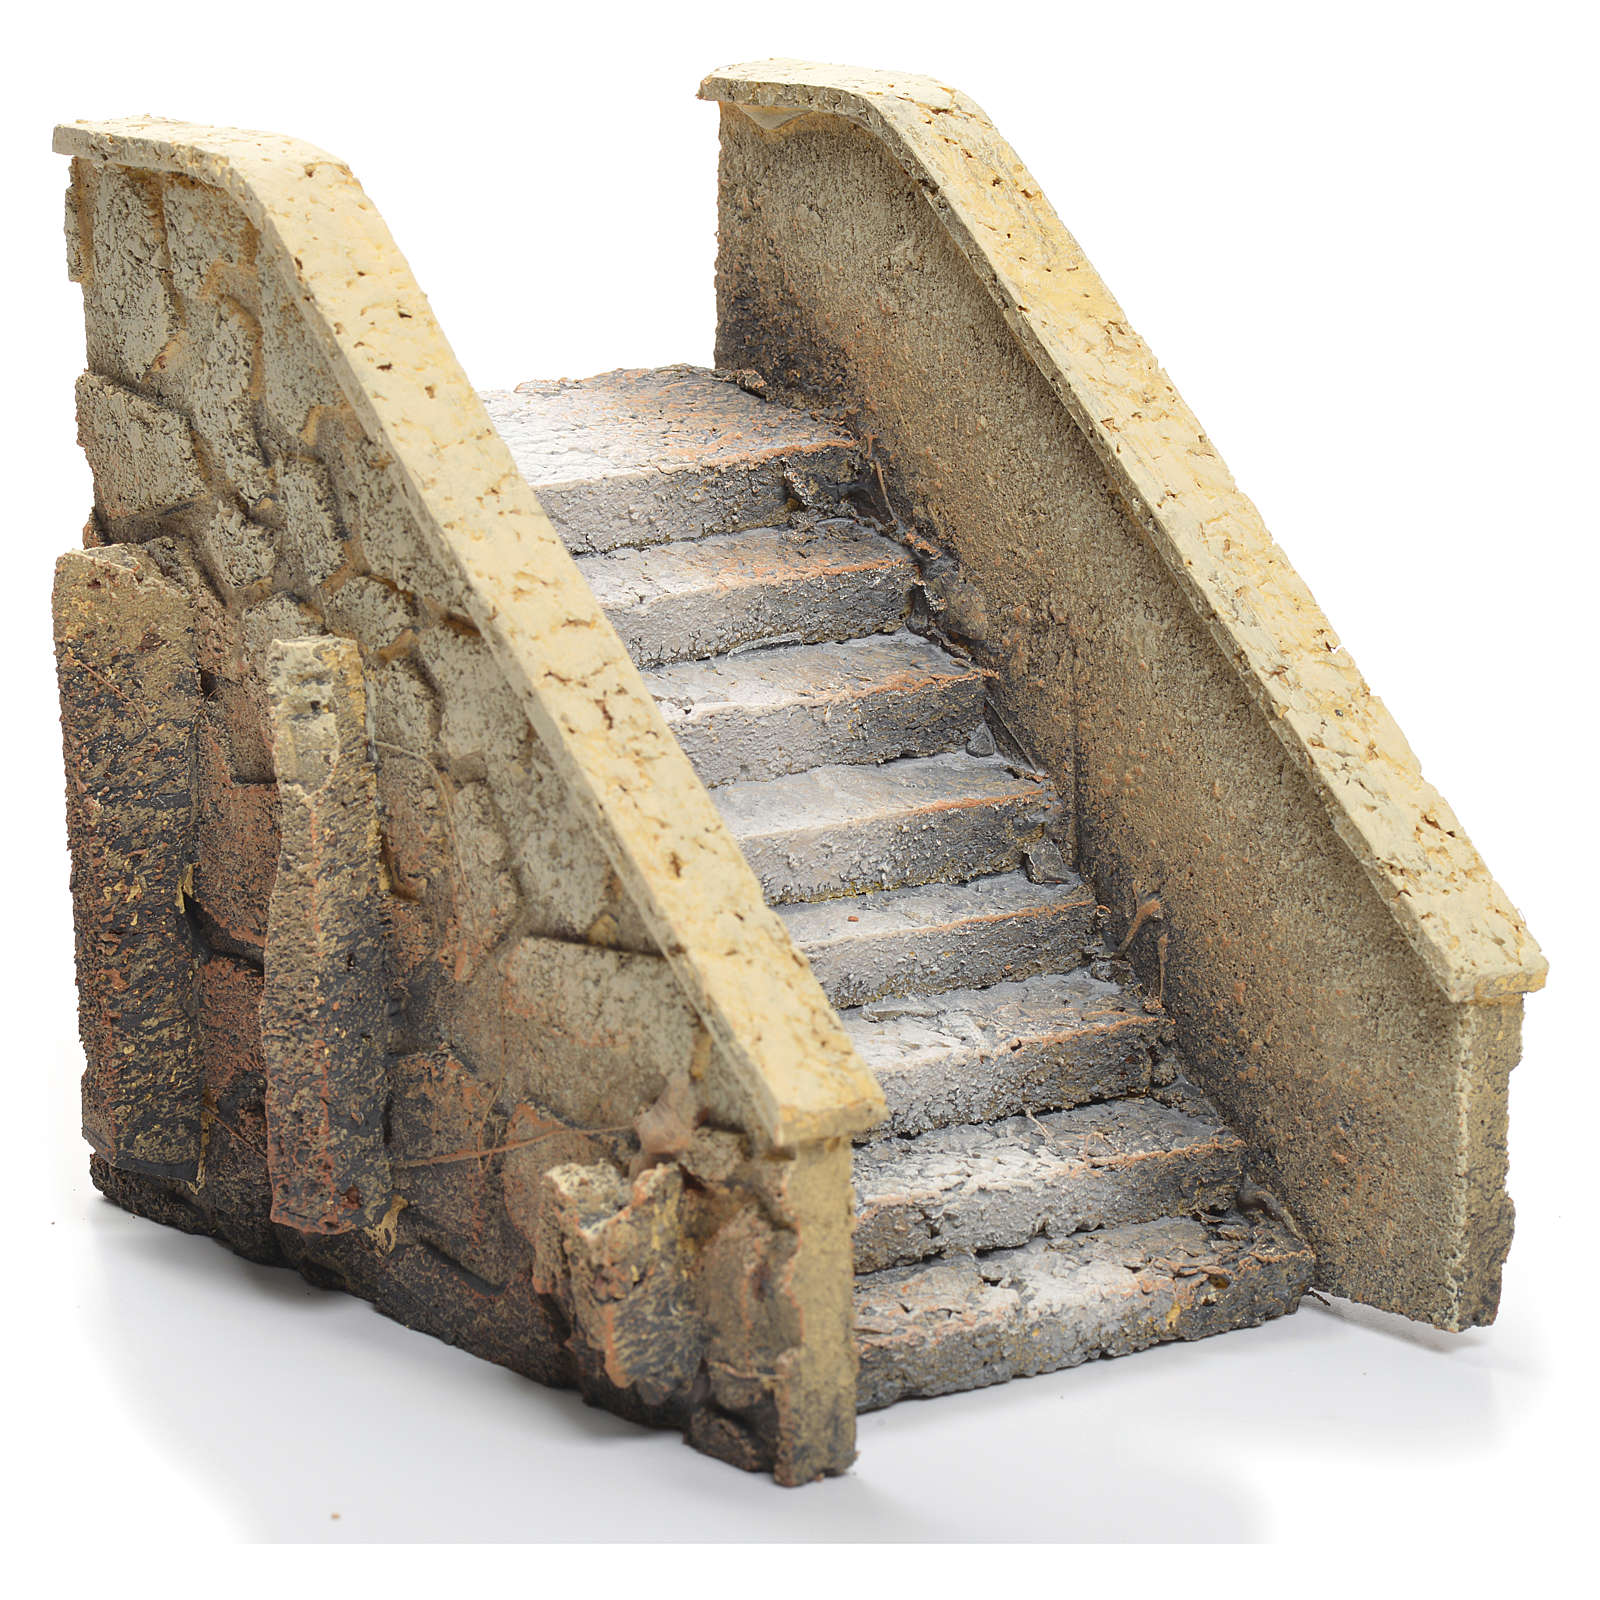 nativity scene stairs cork 14x12x11 cm 4